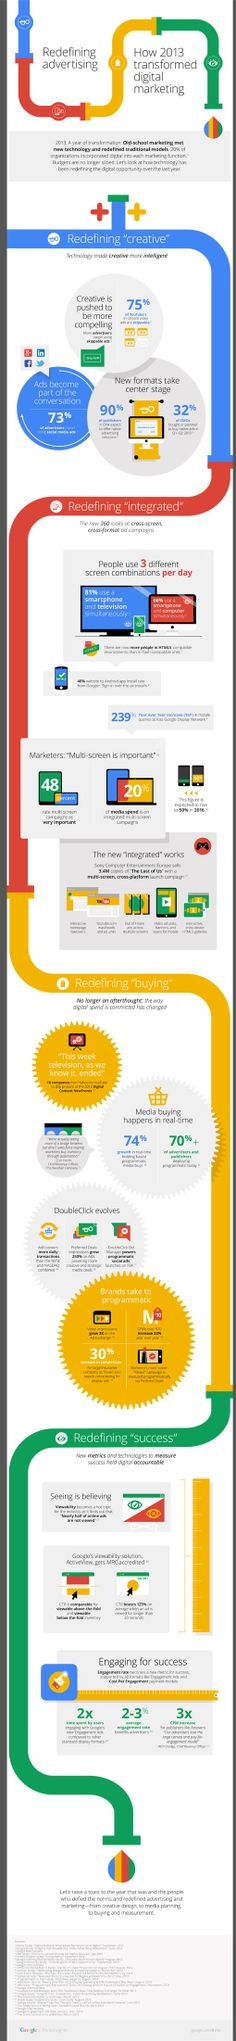 Redefining Advertising - 2013 Digital Marketing transformation - by Google